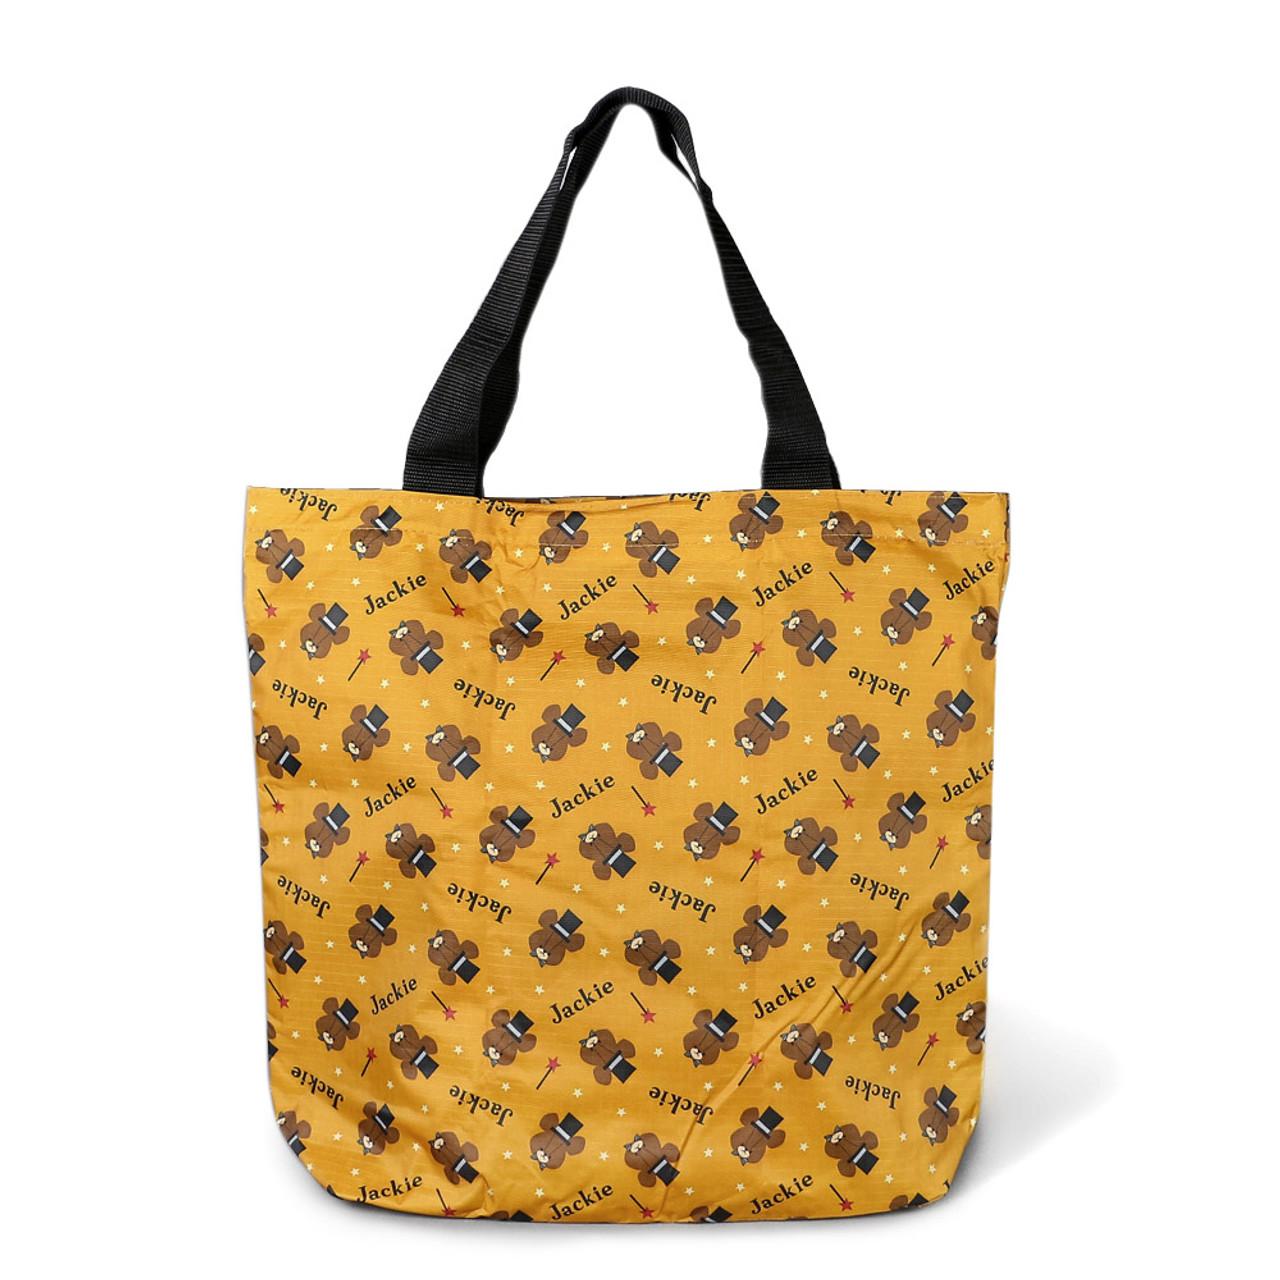 The Bears' School Jackie Shopping Bag - Brown ( Tota Bag Mode )